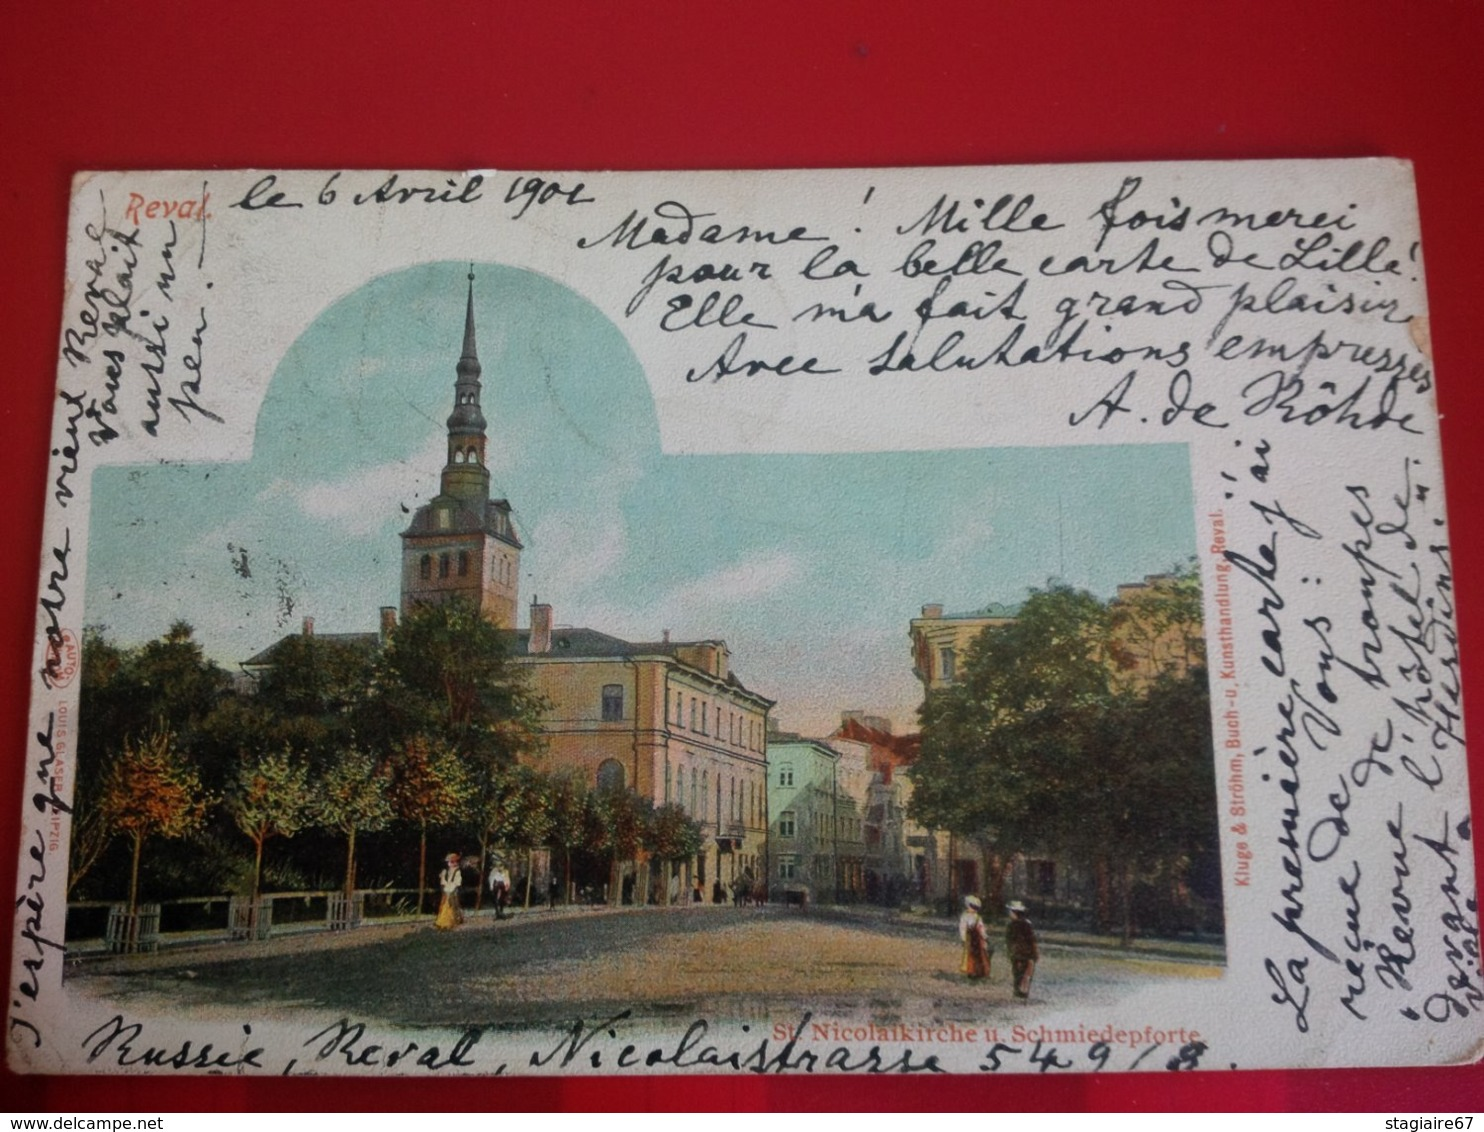 REVAL ST NICOLAIKIRCHE U SCHMIEDEPFORTE - Estland